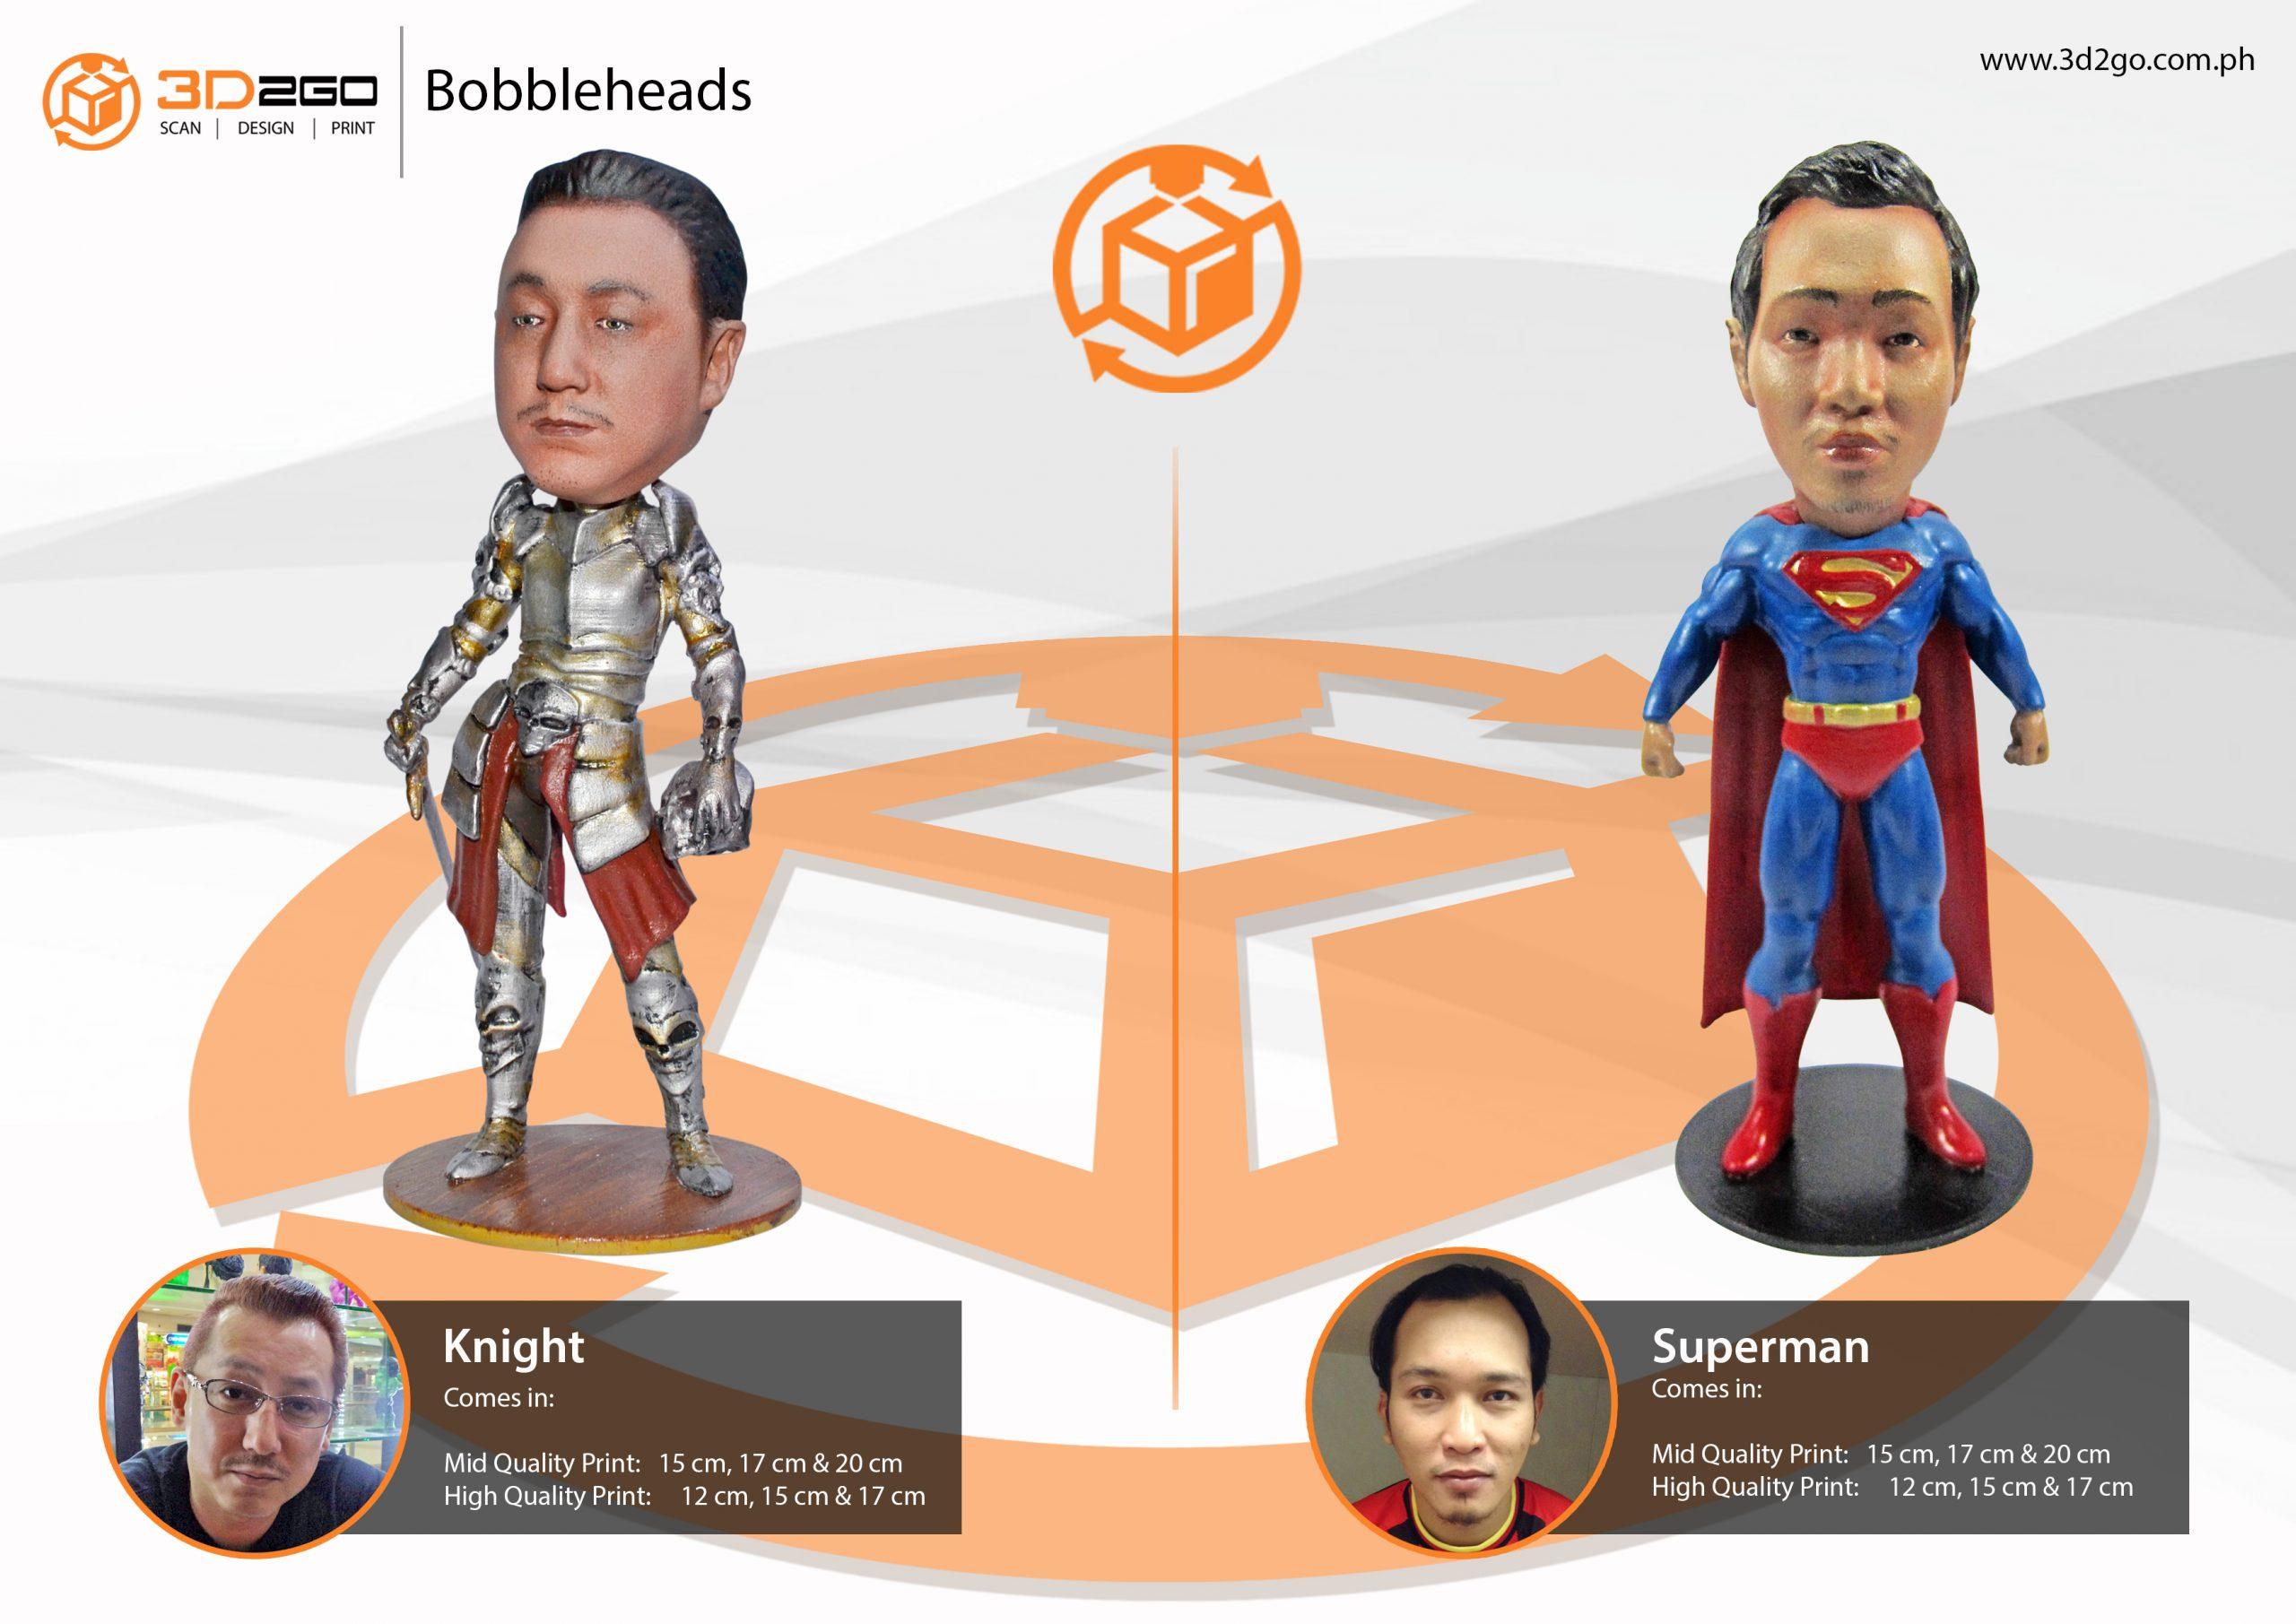 bobblehead-1